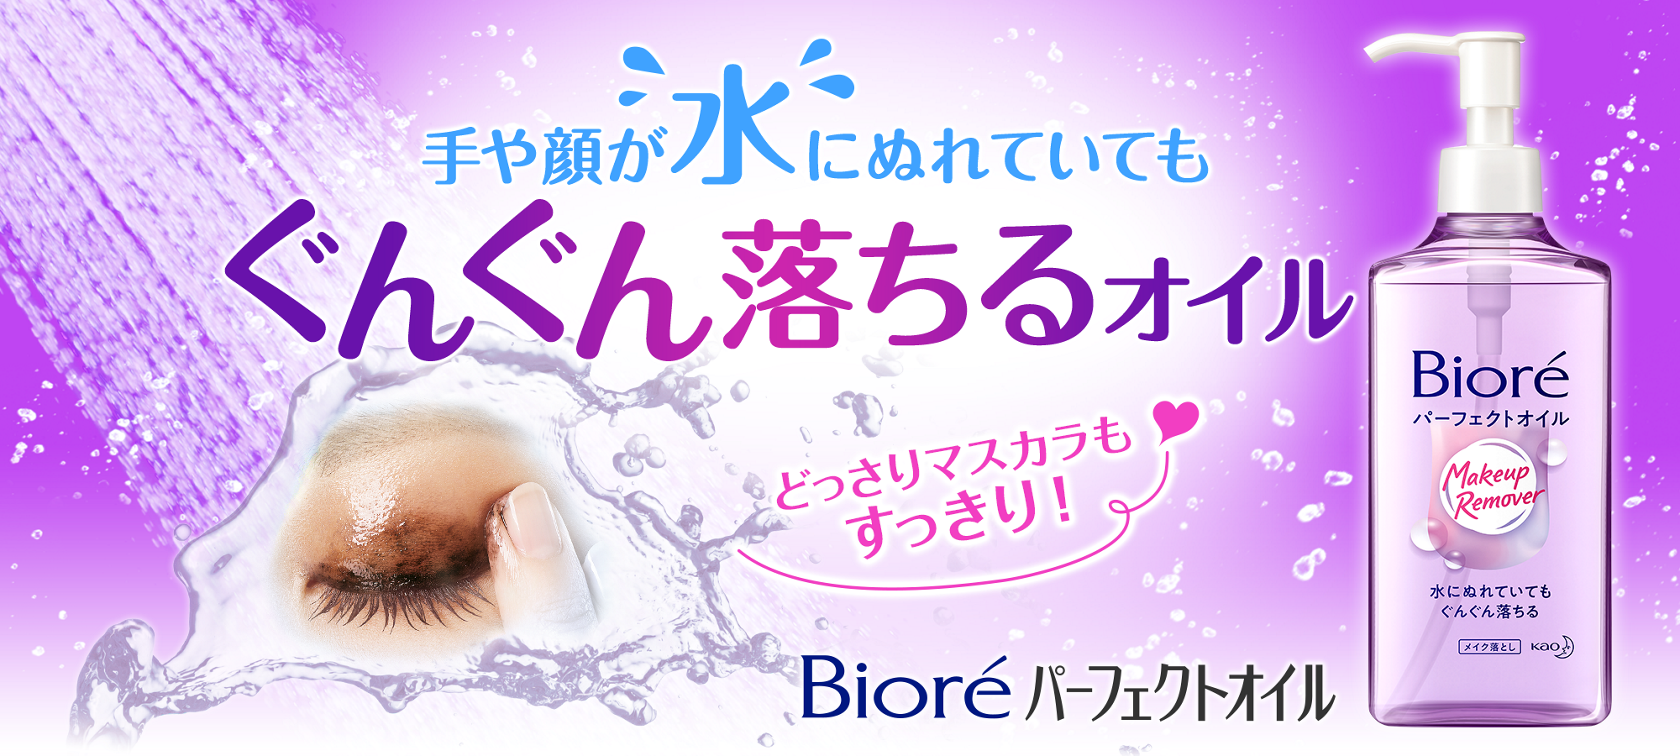 Image result for ビオレ メイク落とし パーフェクトオイル